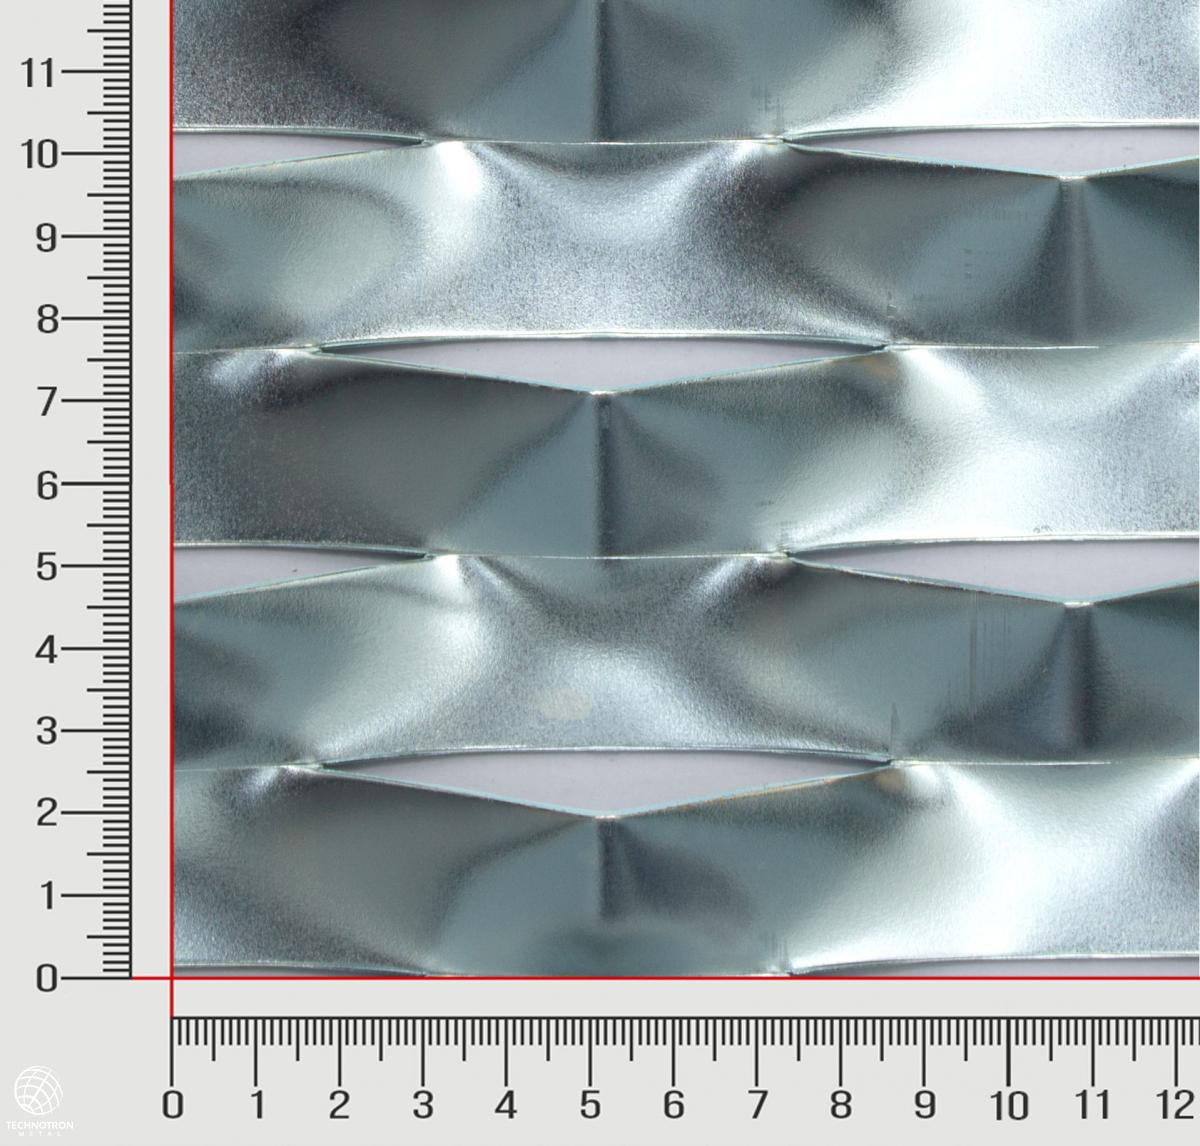 Relax tahokov TR 115 x 52 x 24 mm;  tloušťka 1,5 mm, z materiálu pozink DX51D+Z - DX55D